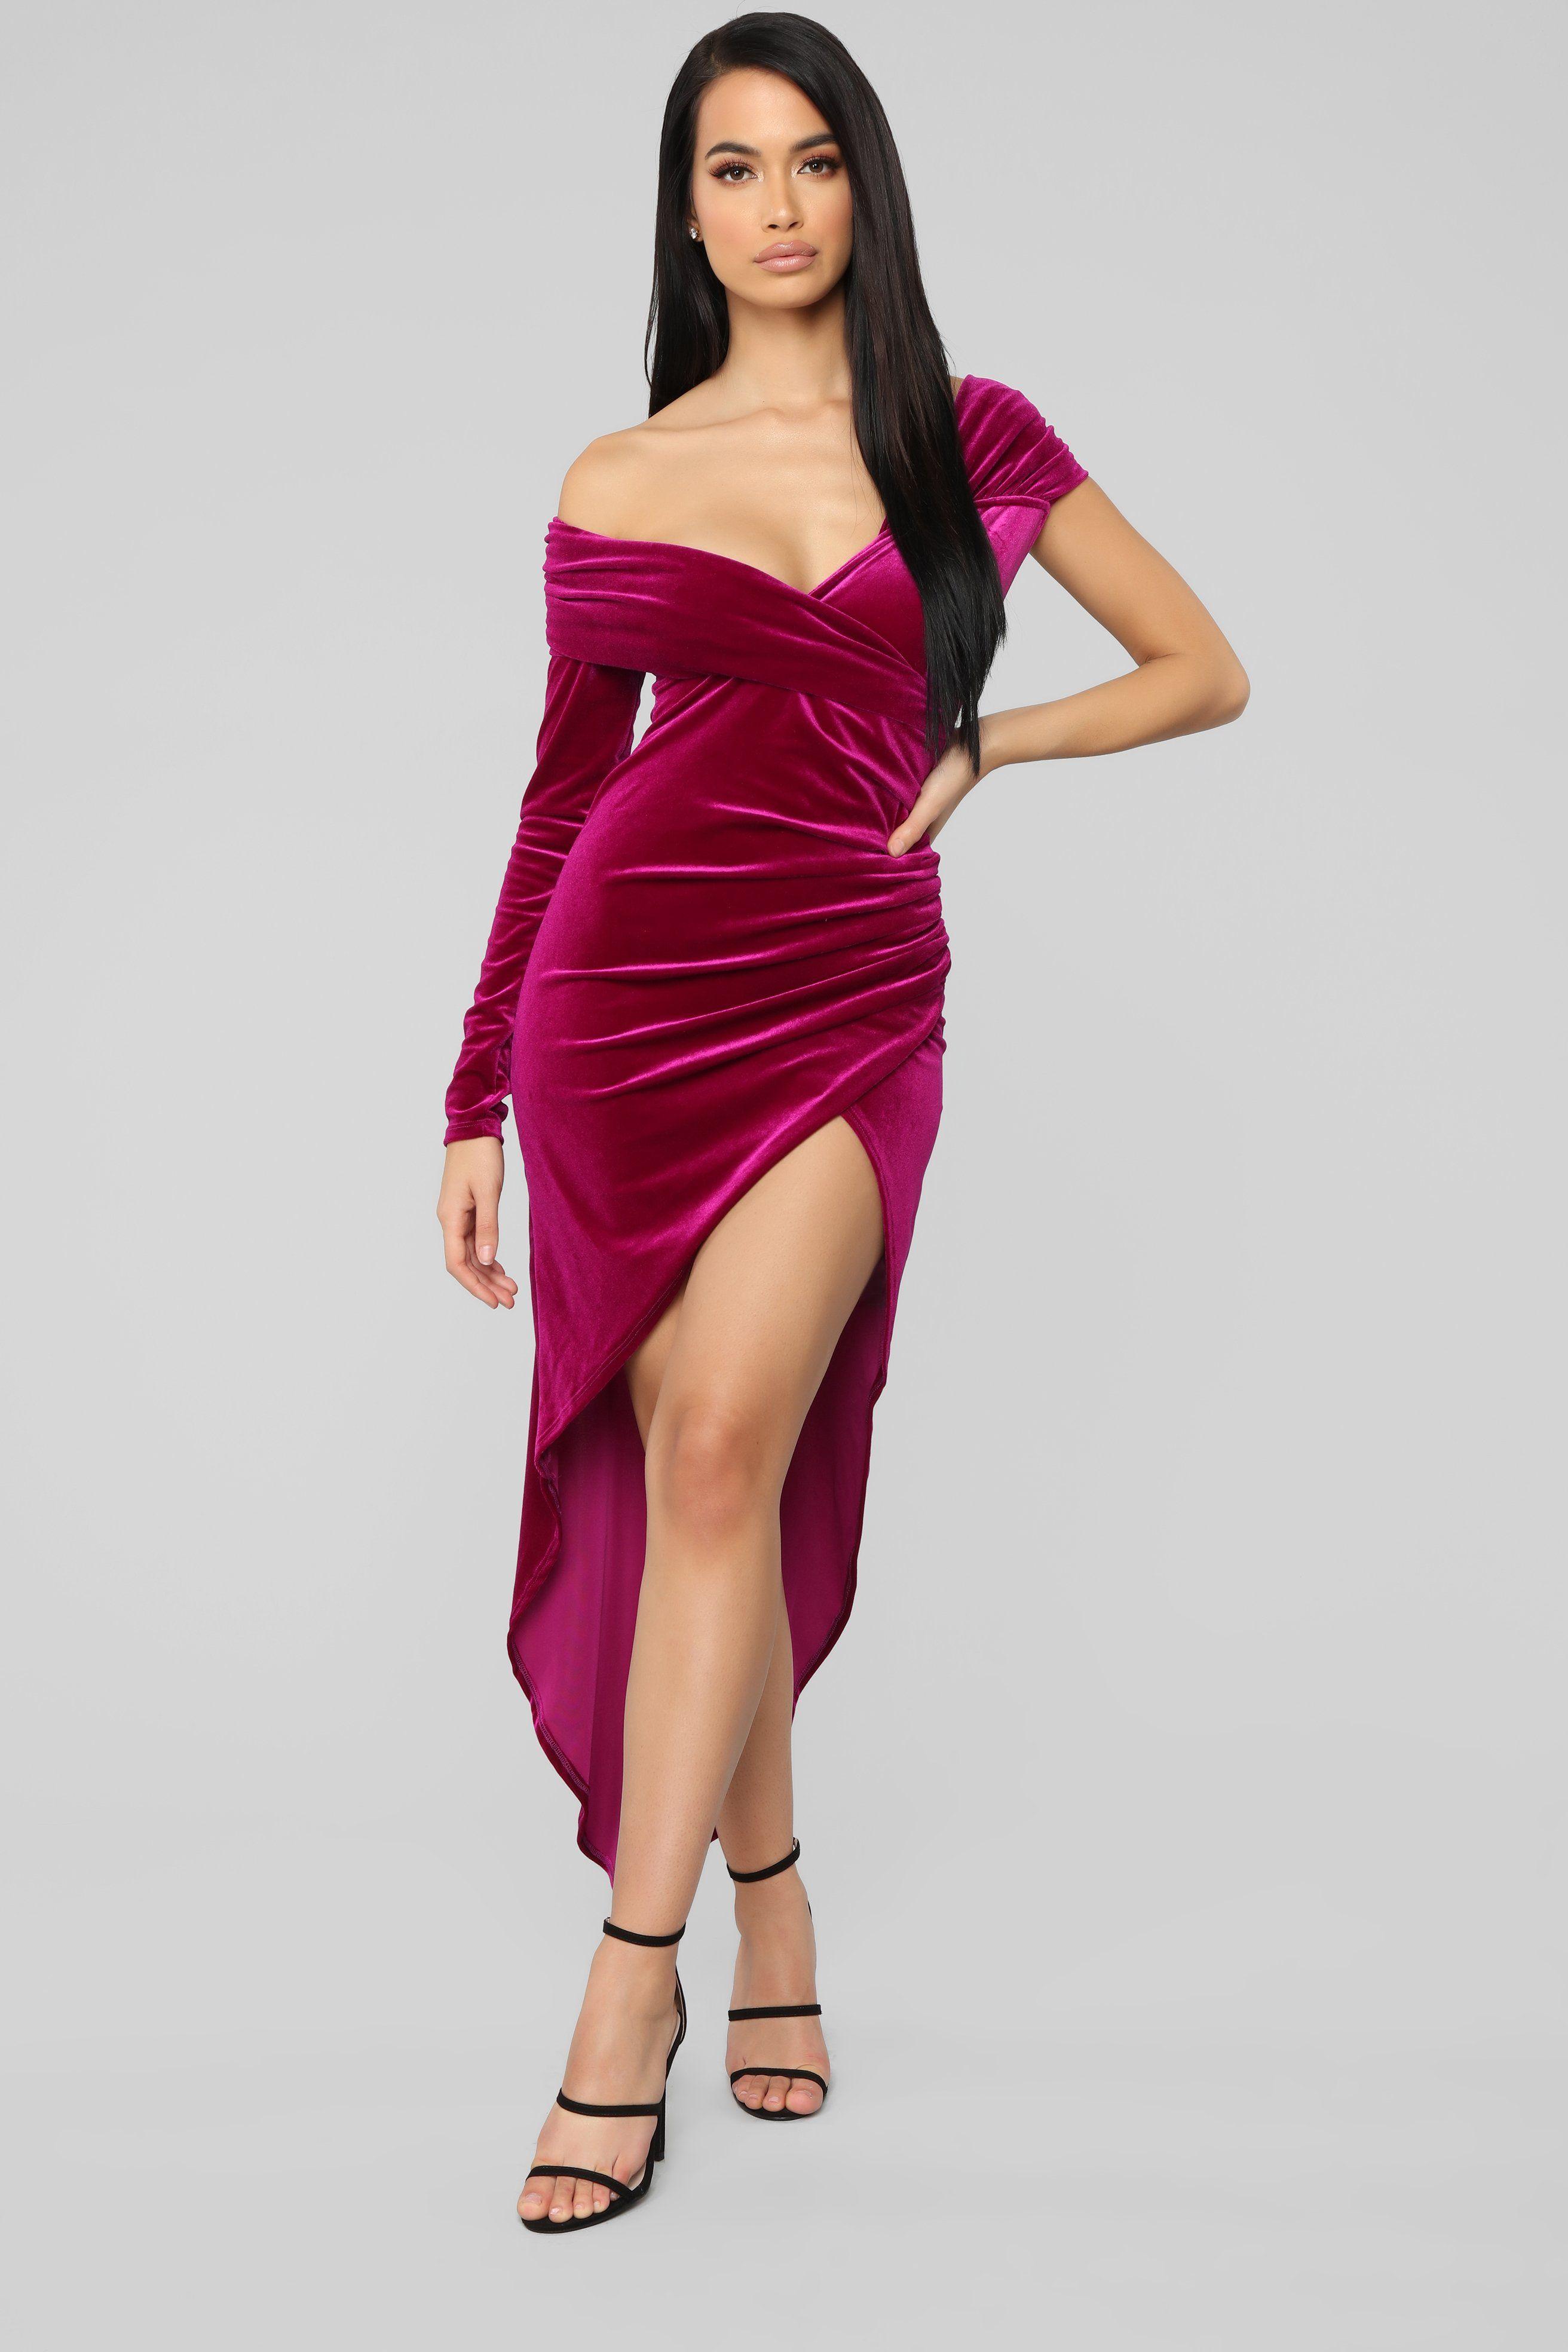 Fashionnova Making Headlines Velvet Dress Purple Rona Mahal Product Page Https Www Fashionnova Com Products Making Headlines Vel [ 3936 x 2624 Pixel ]